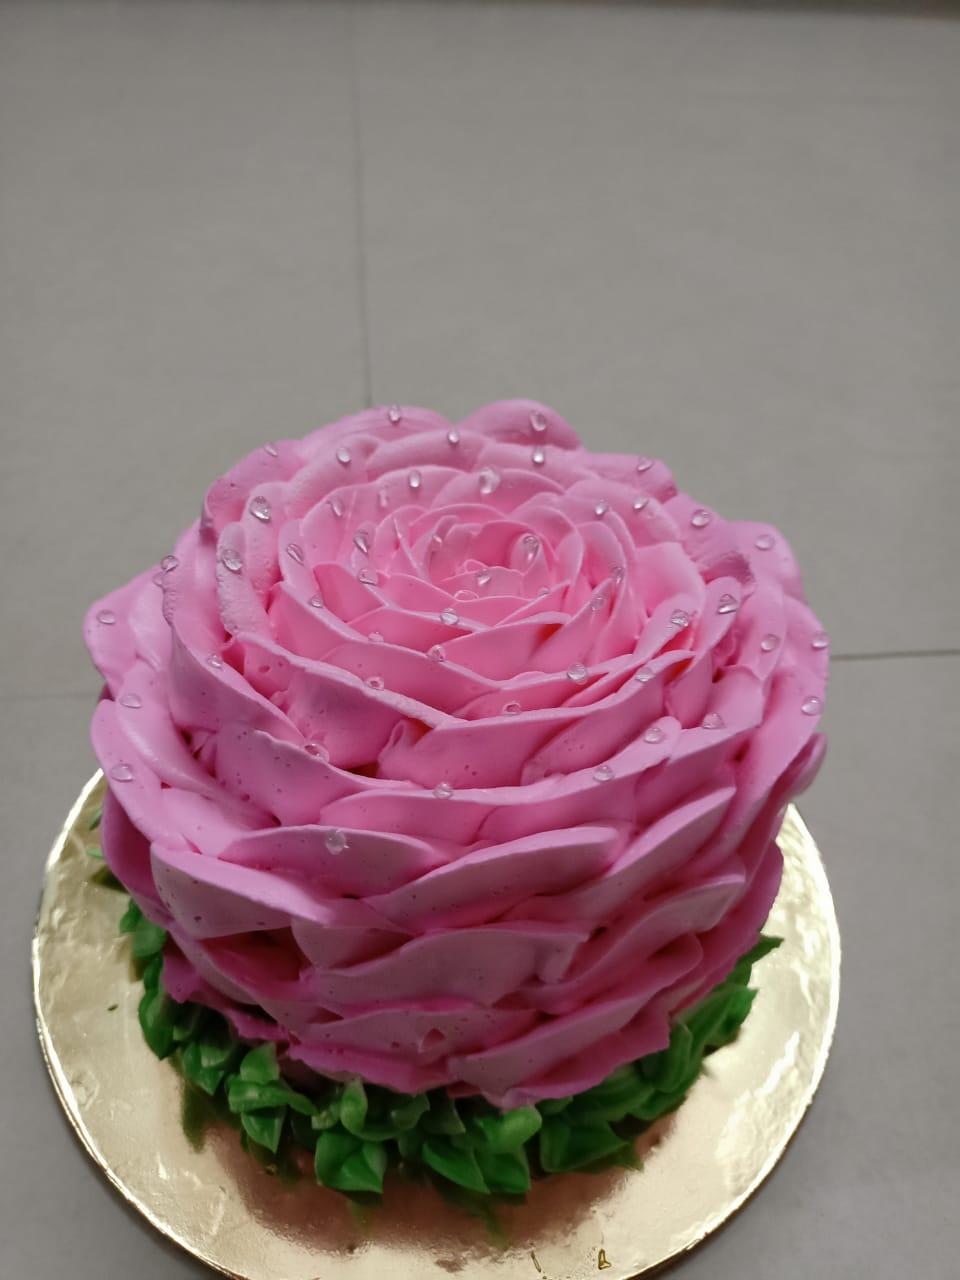 Rose Theme Cake Designs, Images, Price Near Me